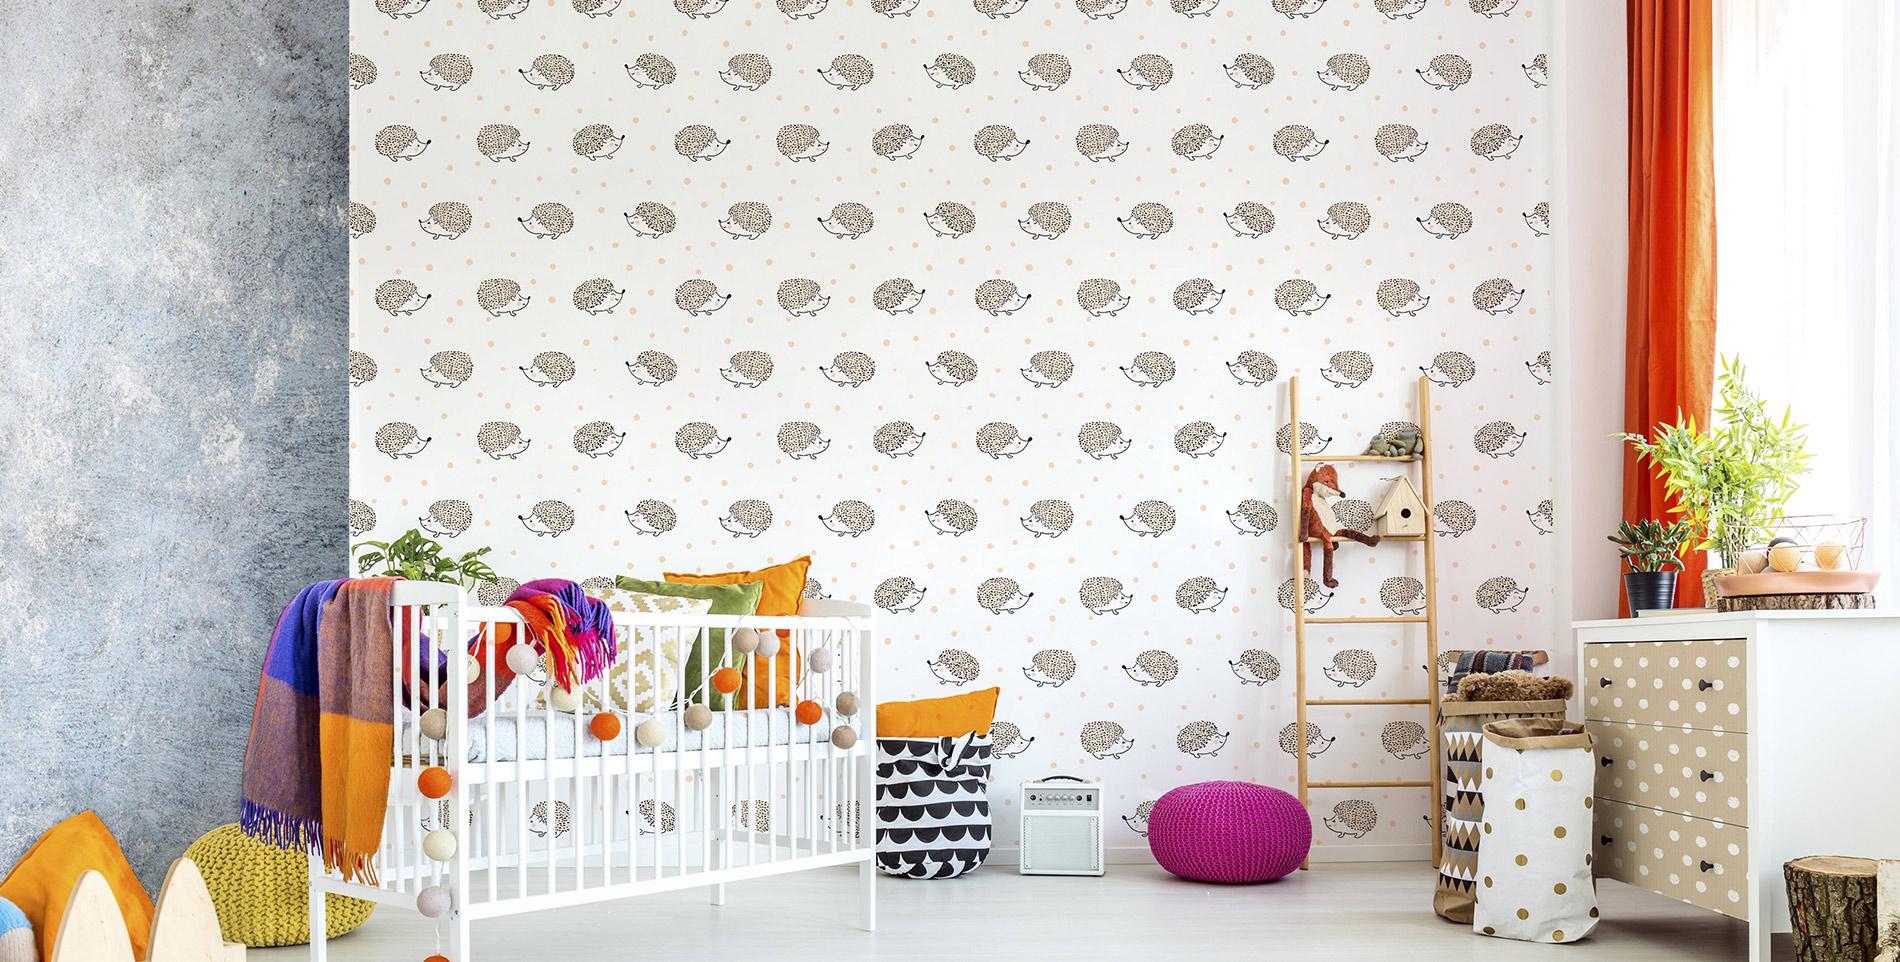 fr hliche kleine igel skandinavisch kinderzimmer. Black Bedroom Furniture Sets. Home Design Ideas